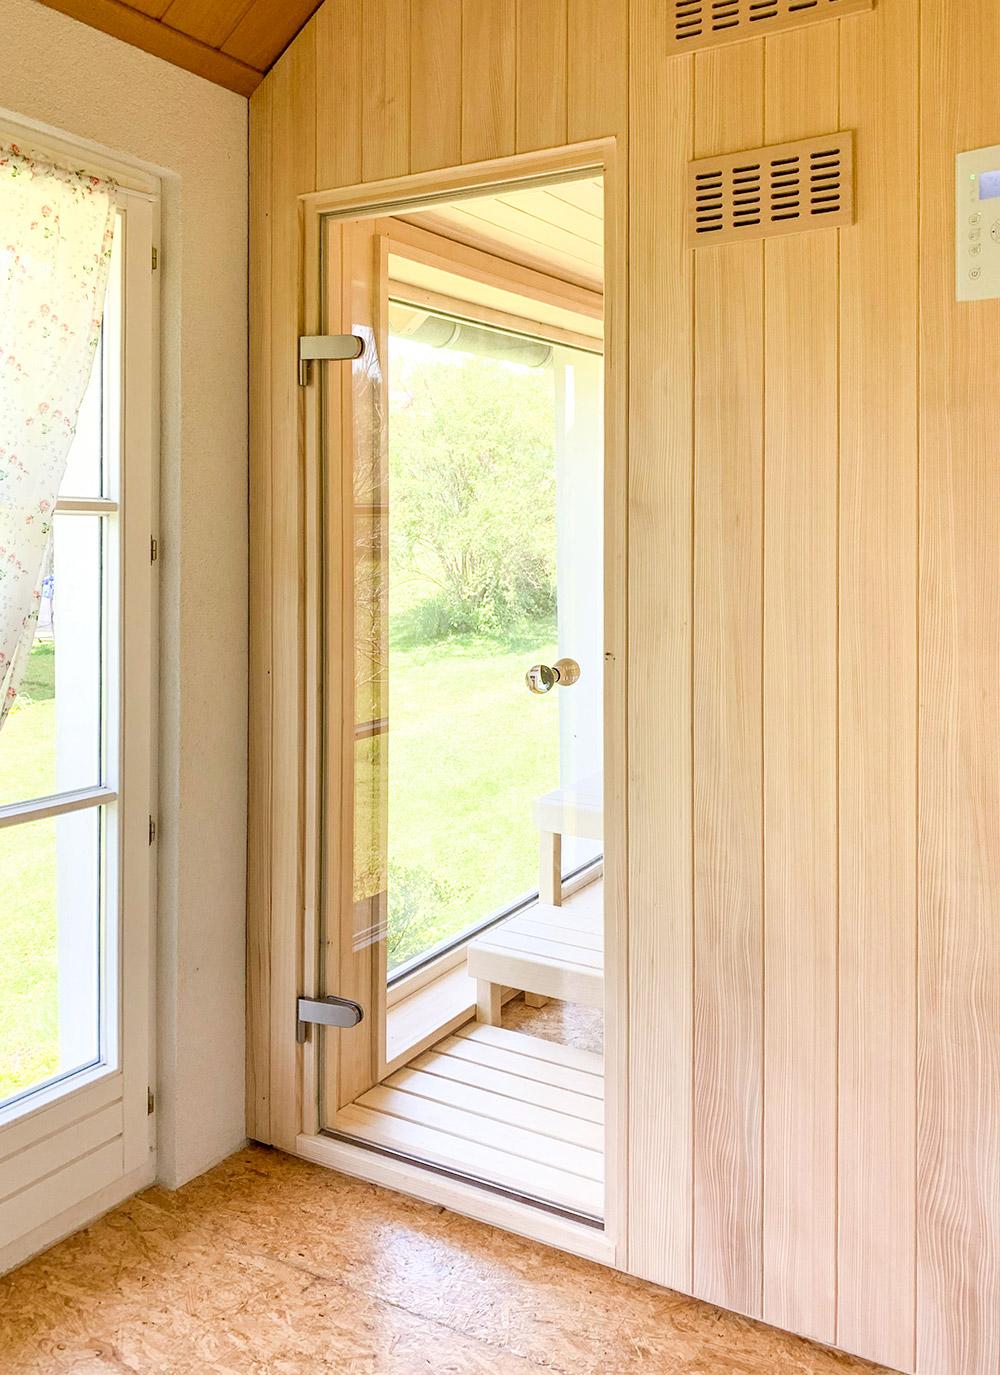 KOERNER Sauna mit Glastür